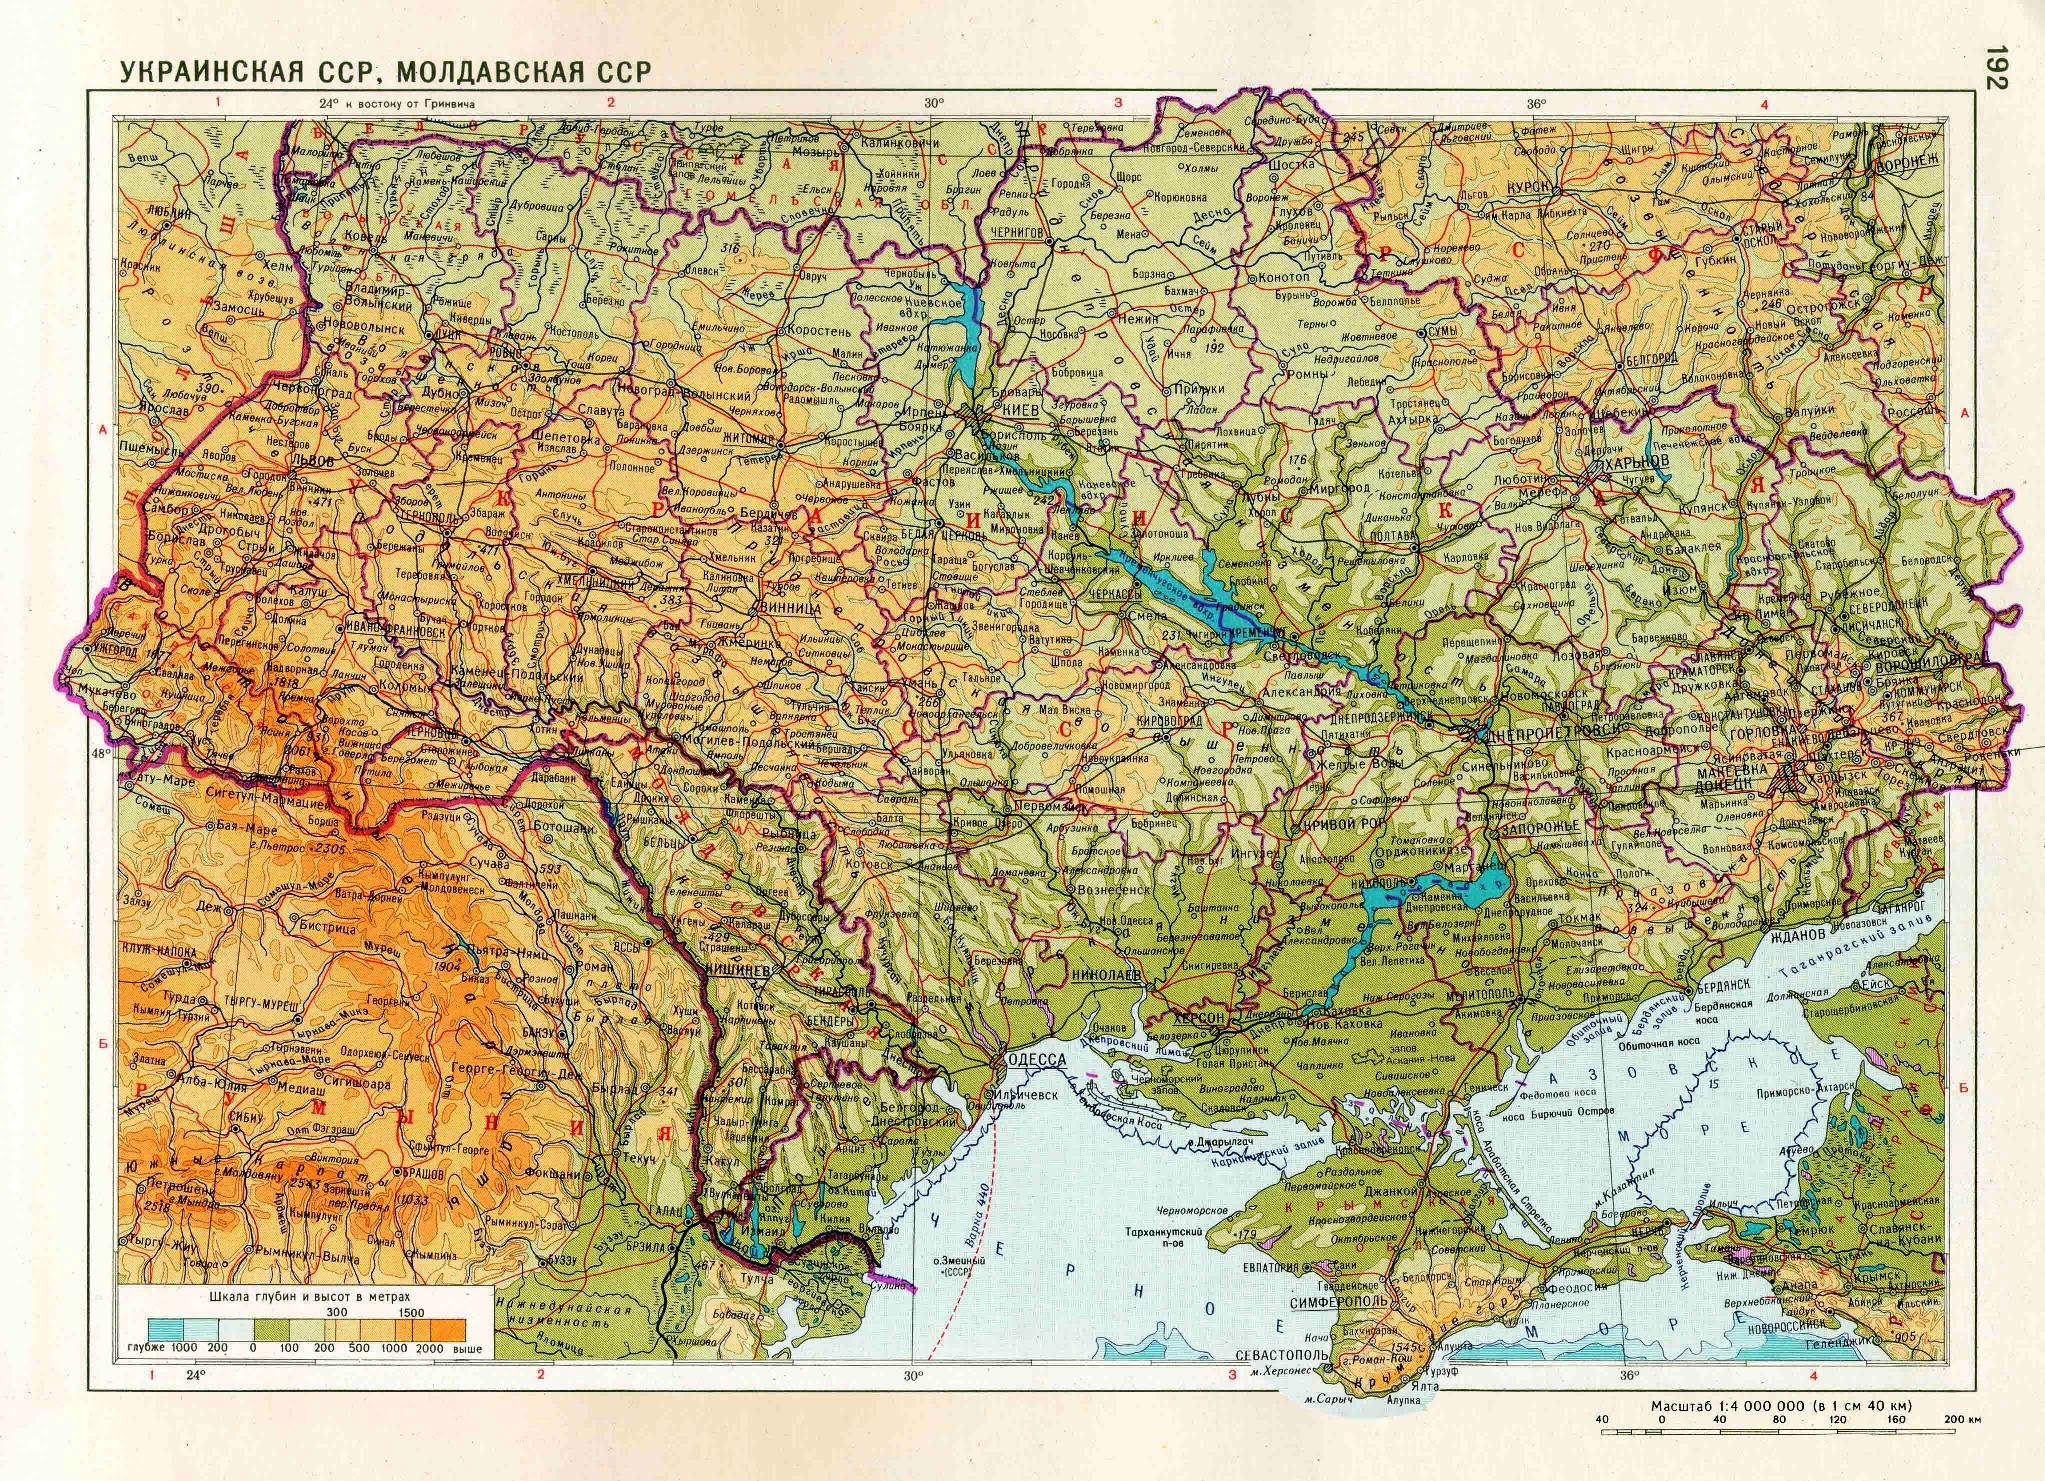 Cartina Geografica Russia Ucraina.Mappa Geografica Dell Ucraina Geografia Clima Flora Fauna